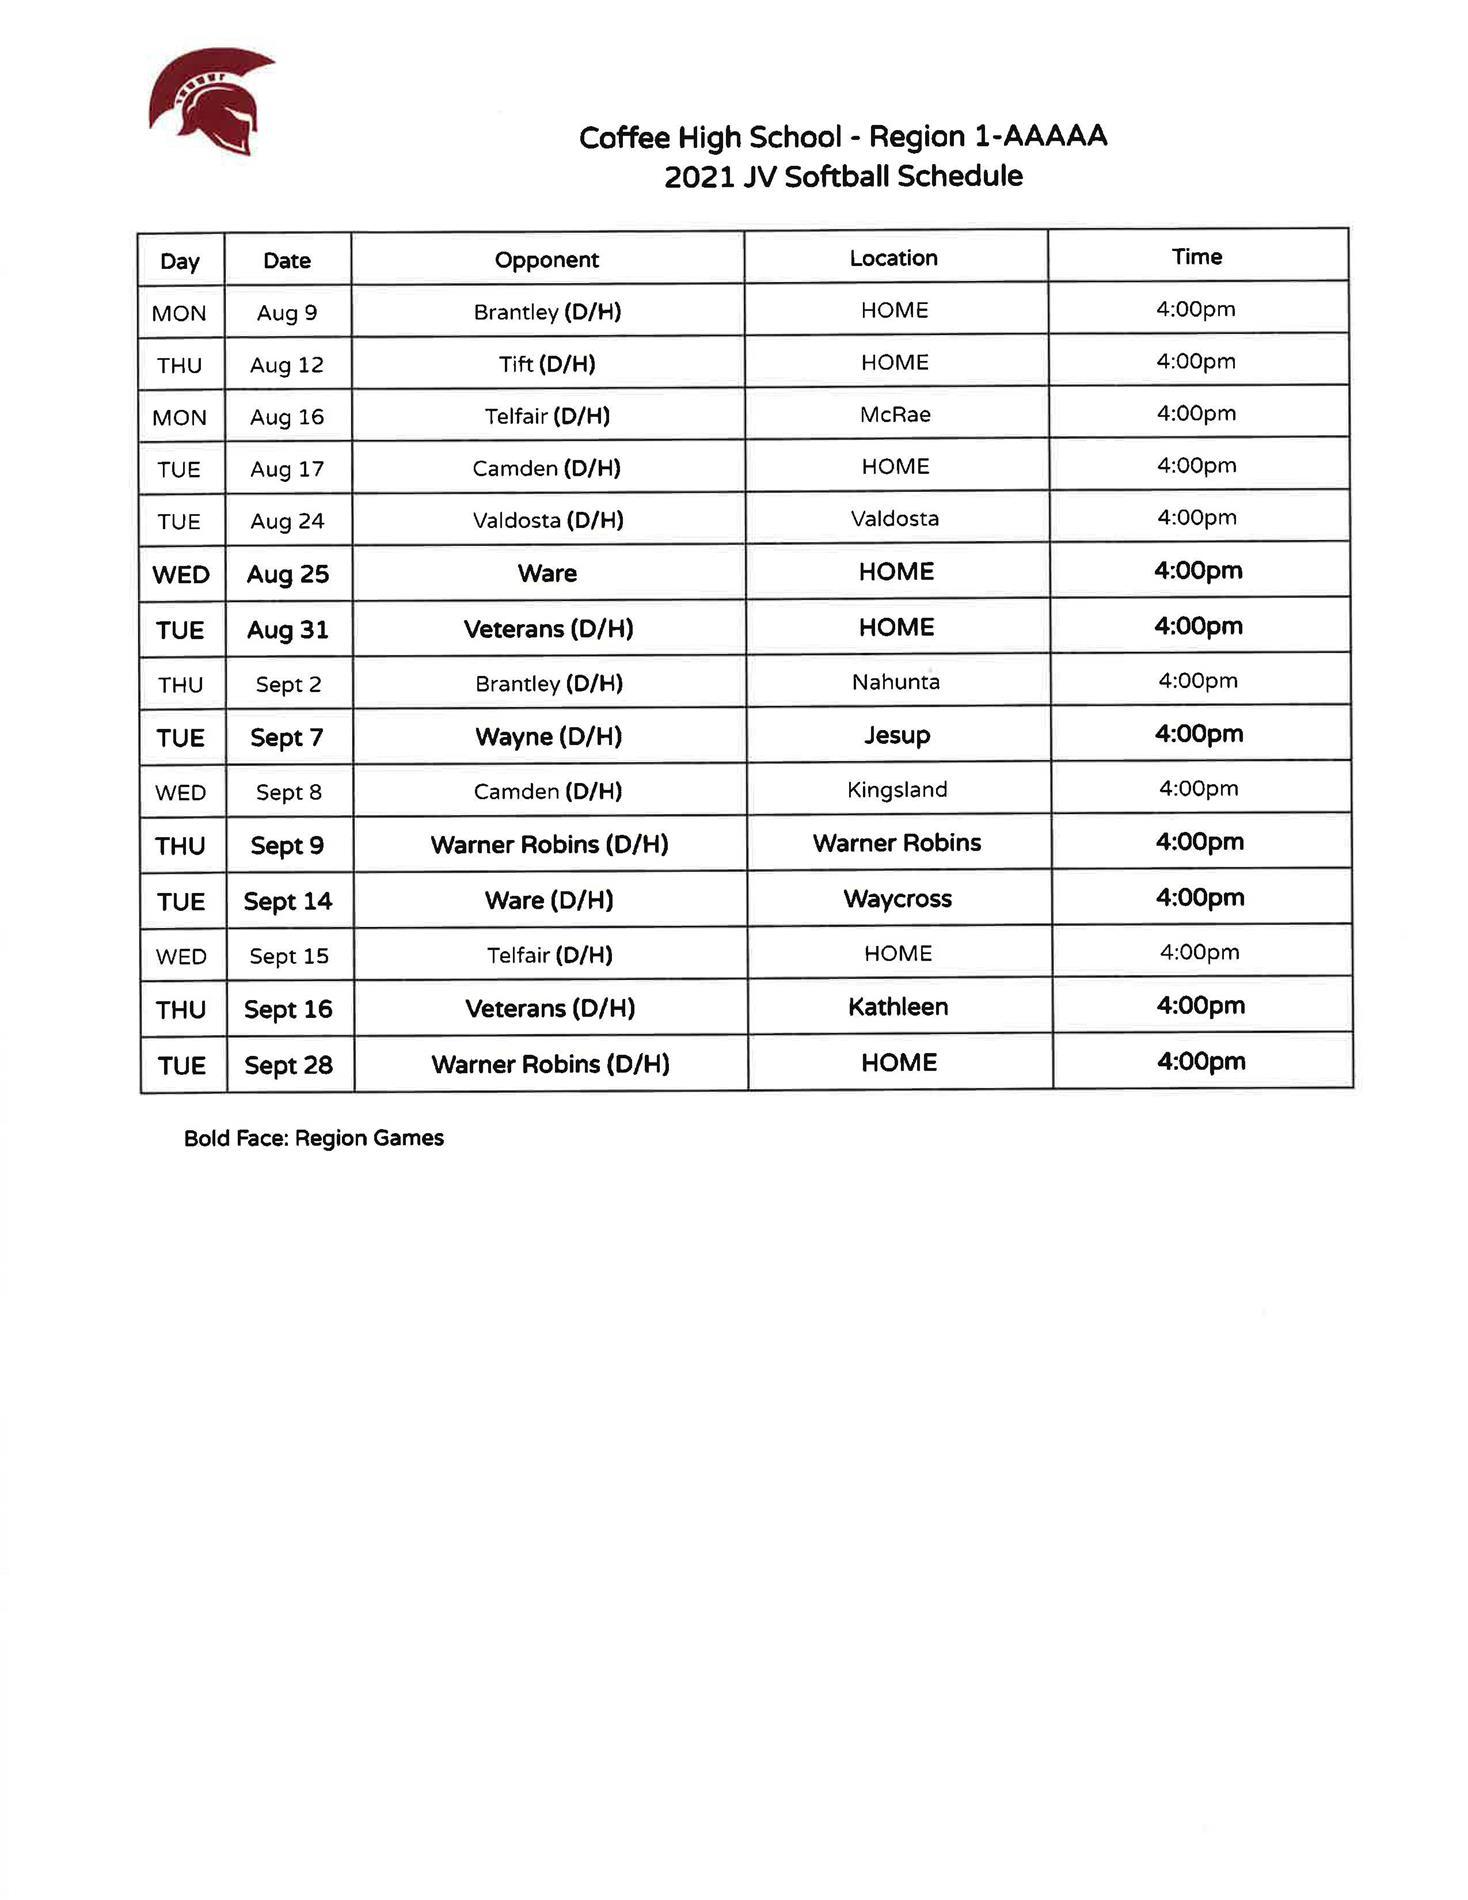 2021 CHS Lady Trojans JV Softball Schedule